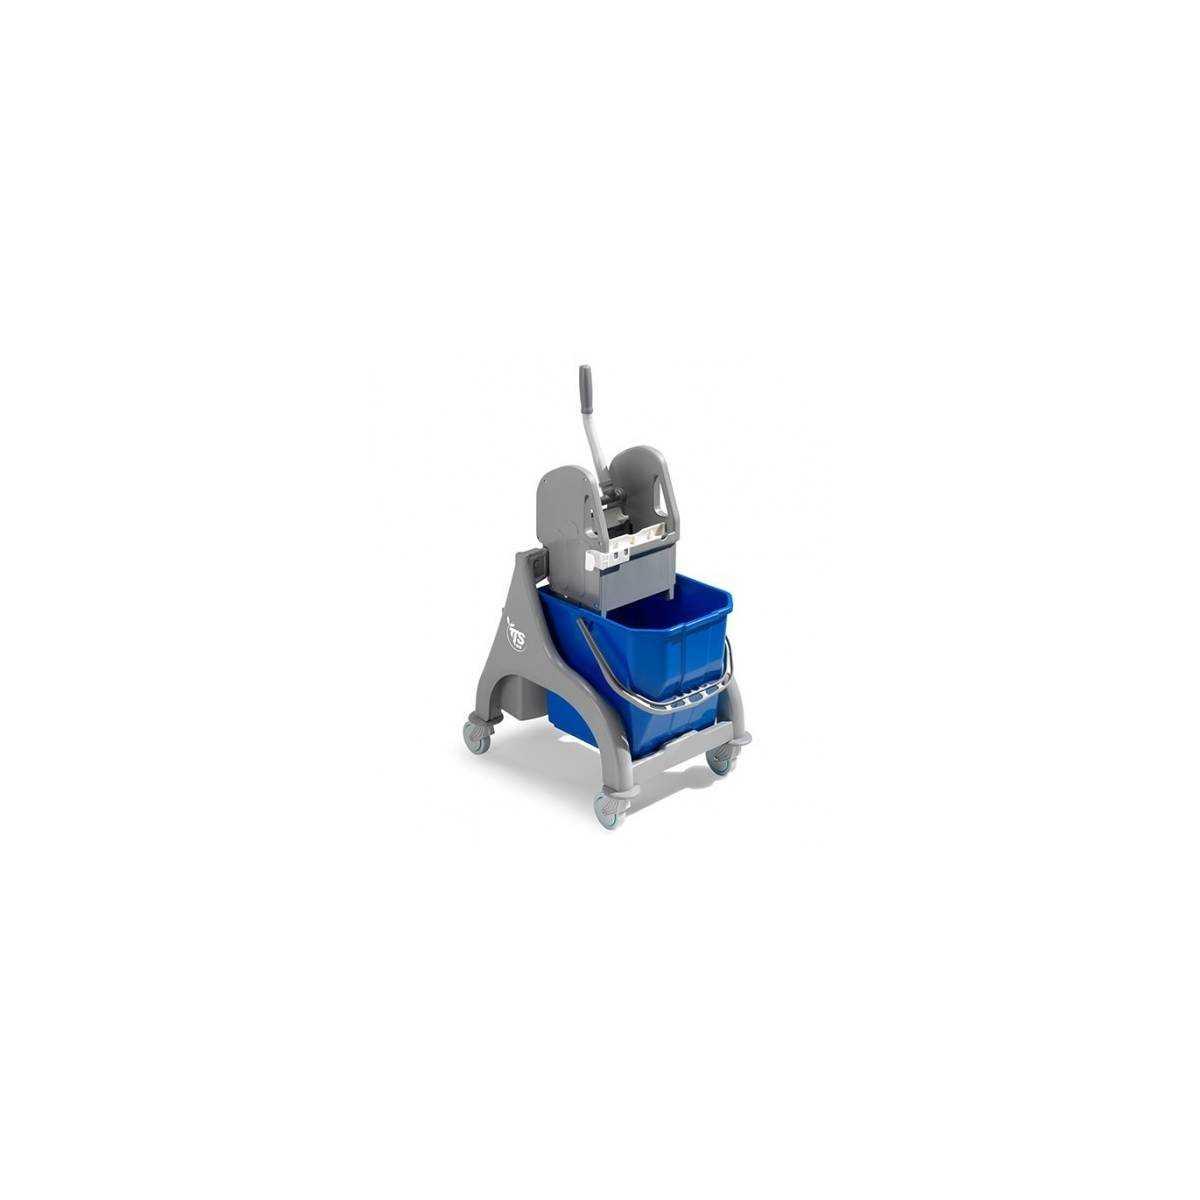 Тележка для уборки Nick 25L (6047) 00006047 TTS